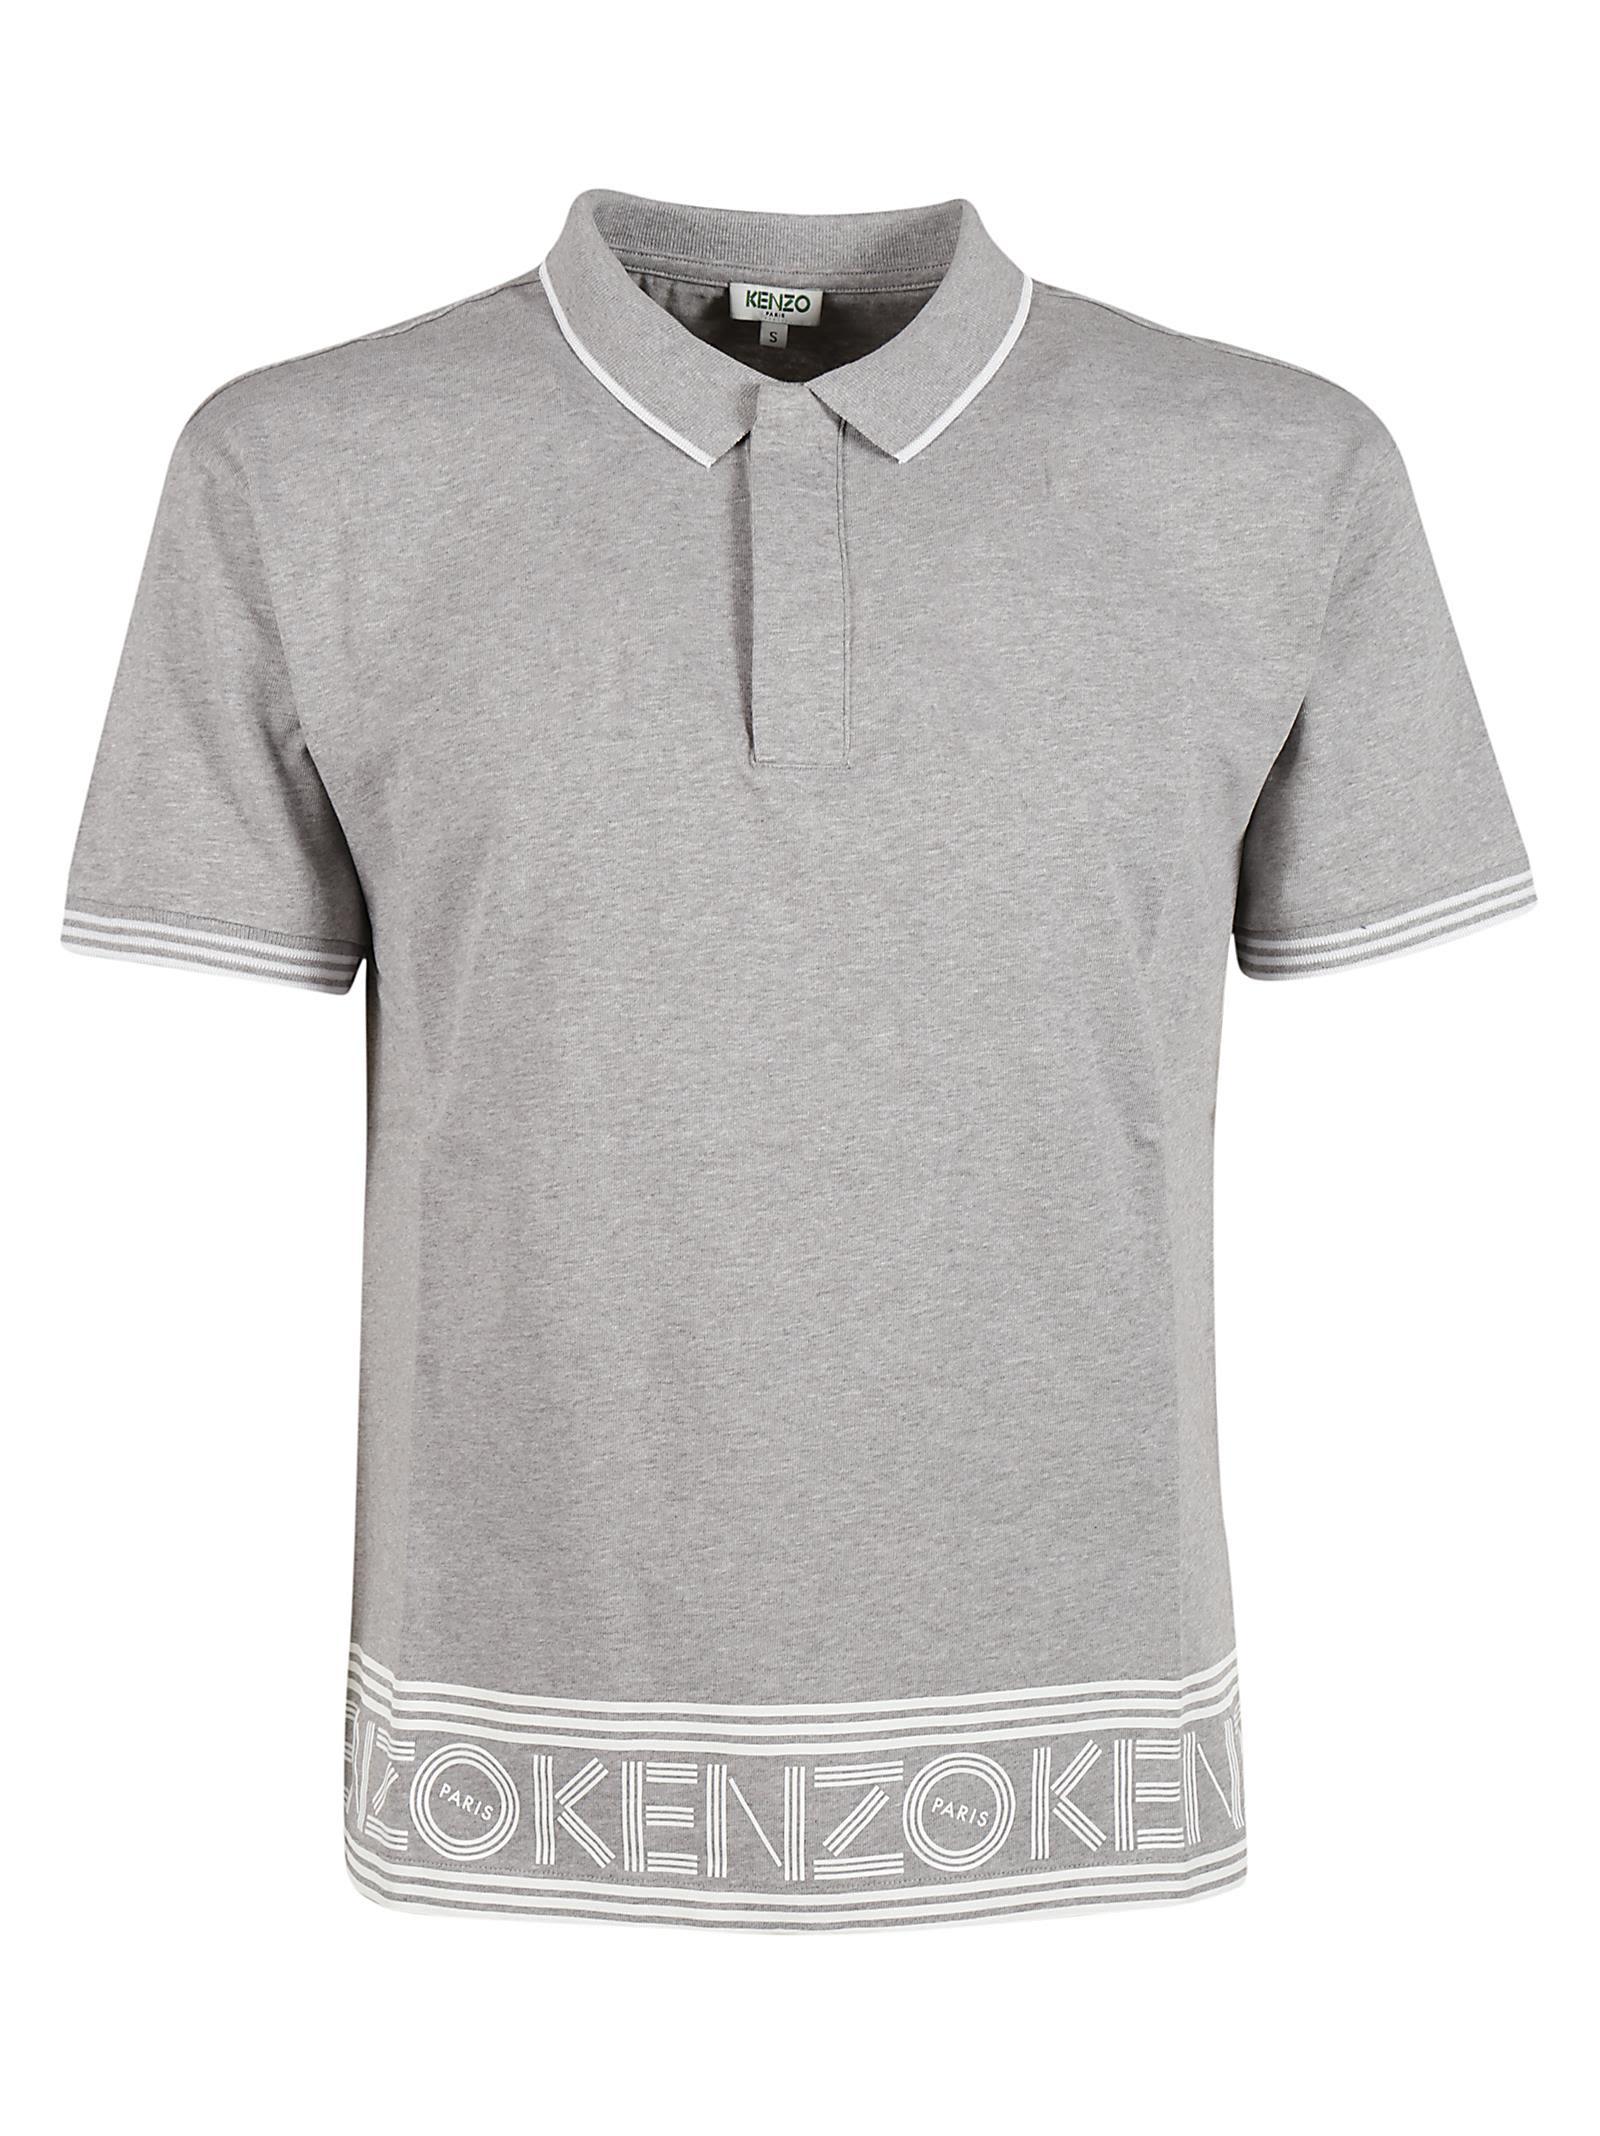 Kenzo Skate Polo Shirt 9996852